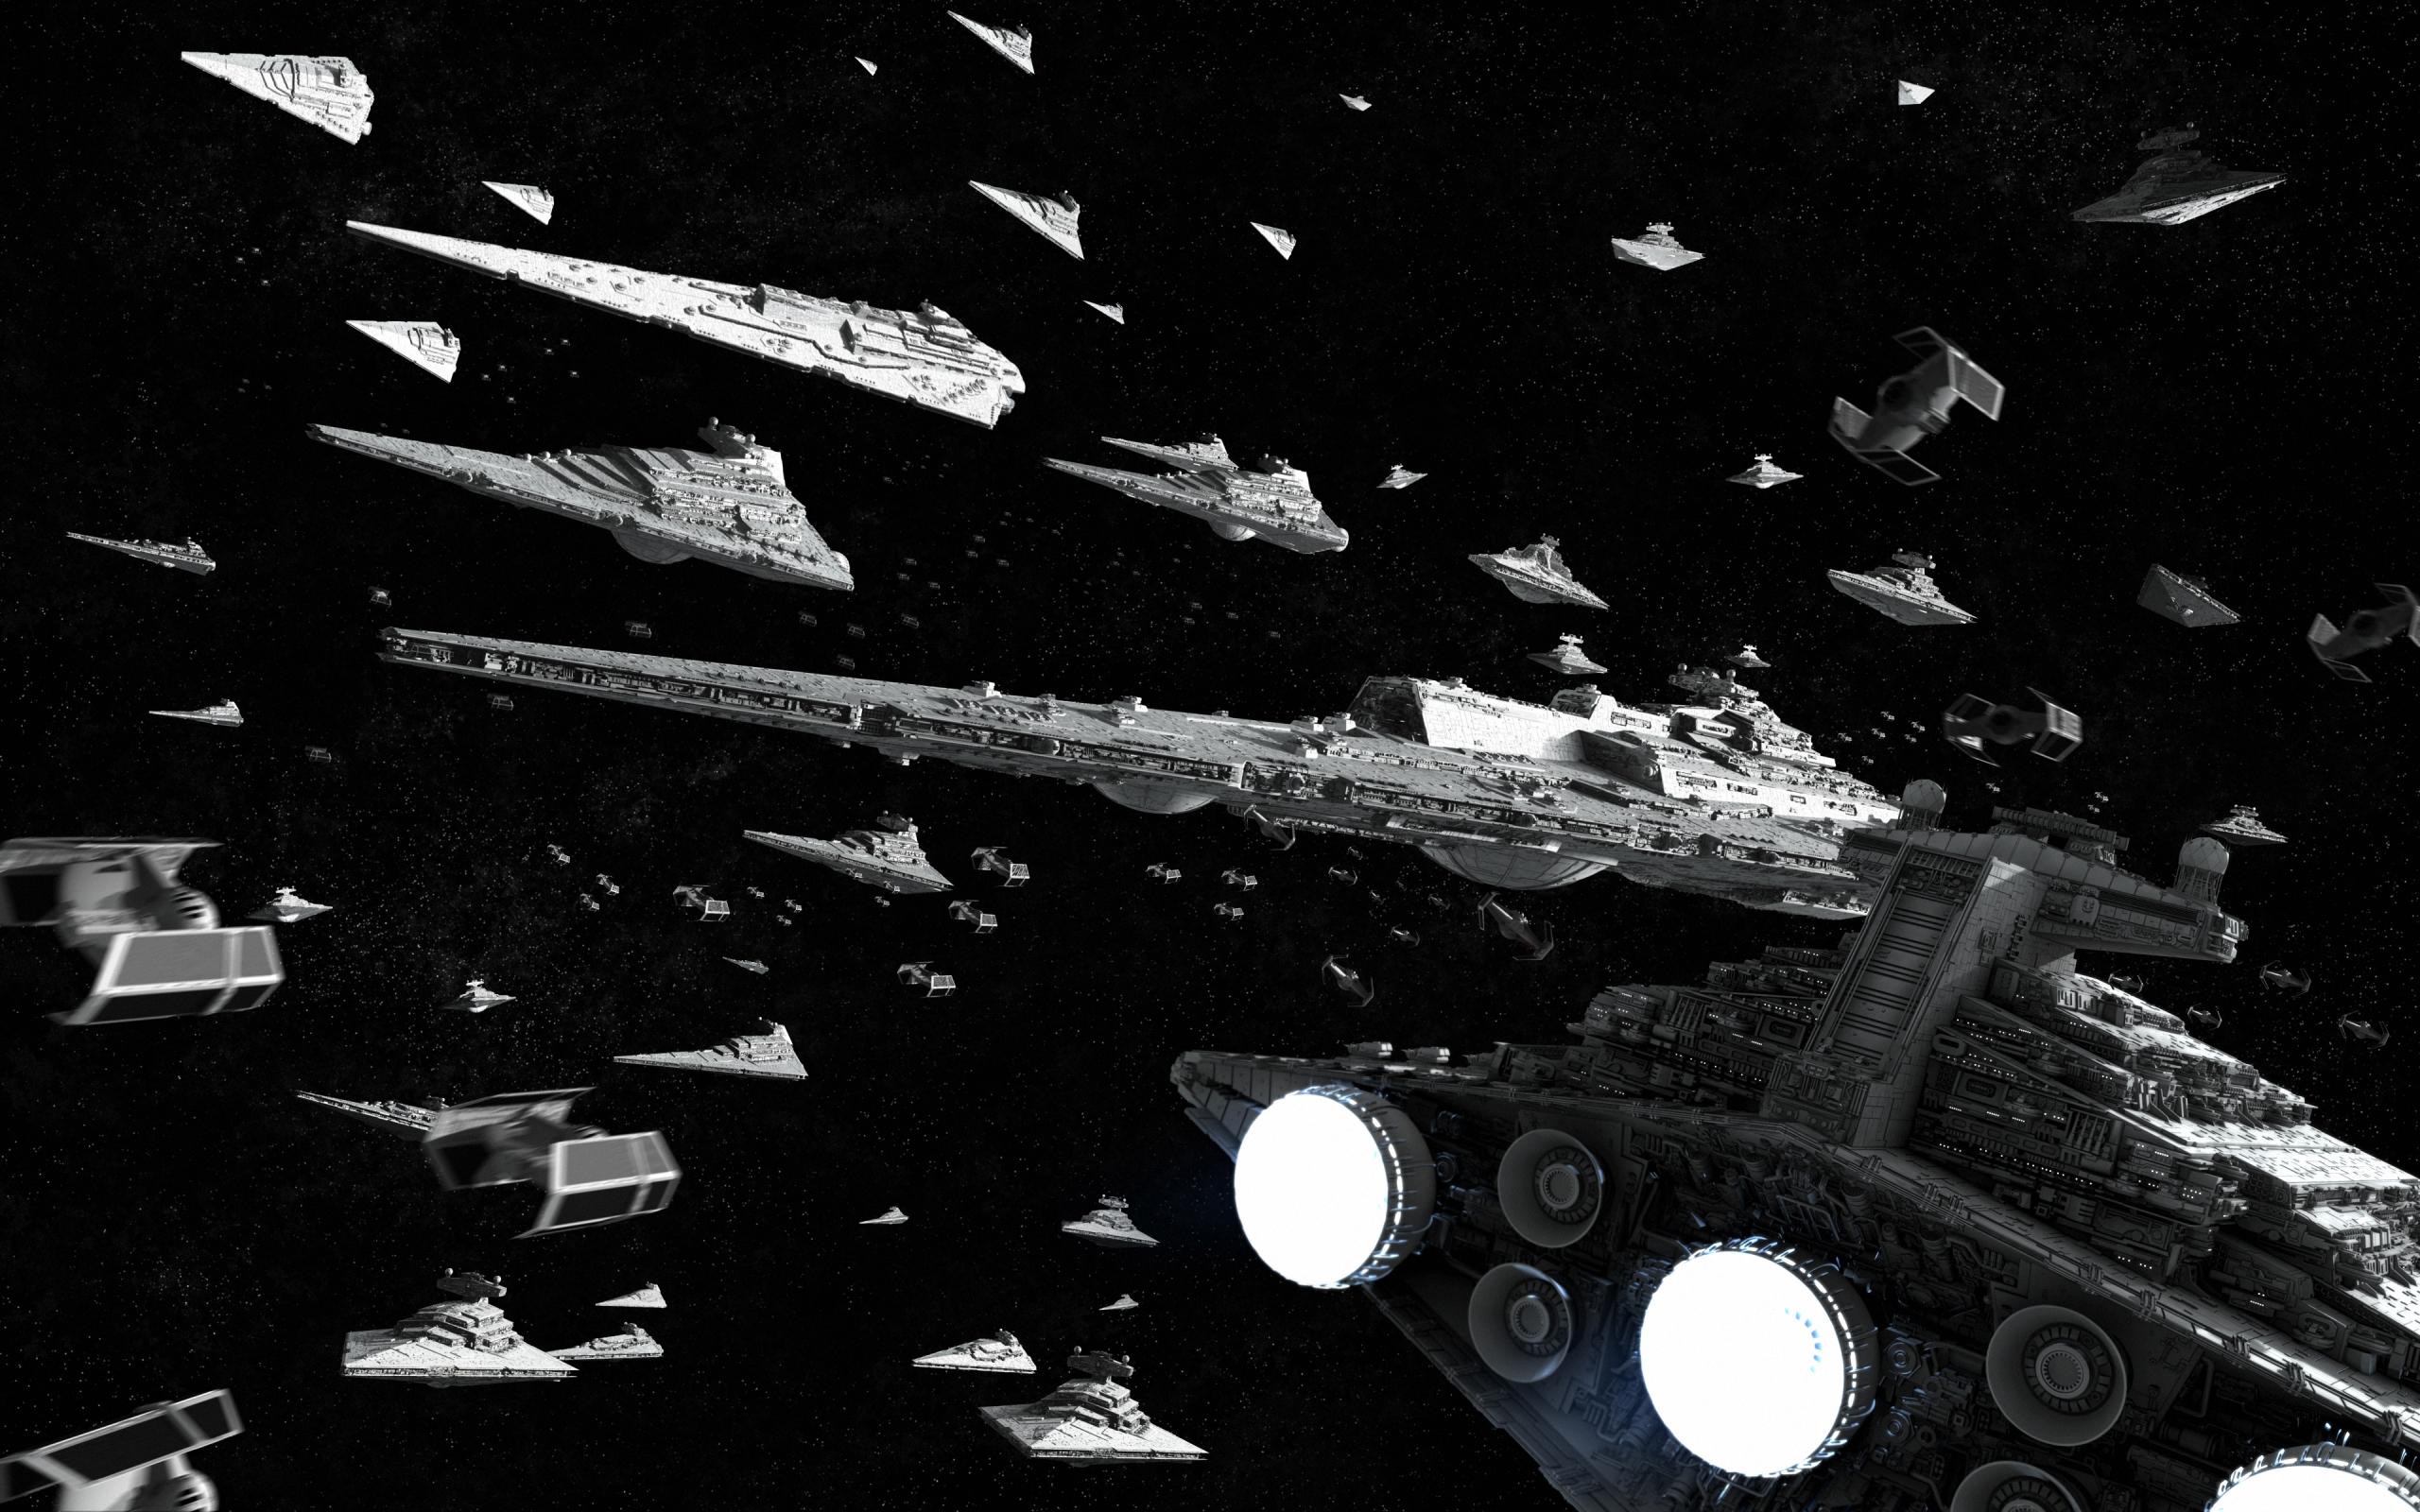 General 2560x1600 Star Wars CGI spaceship digital art Star Destroyer Imperial Forces render Star Wars Ships